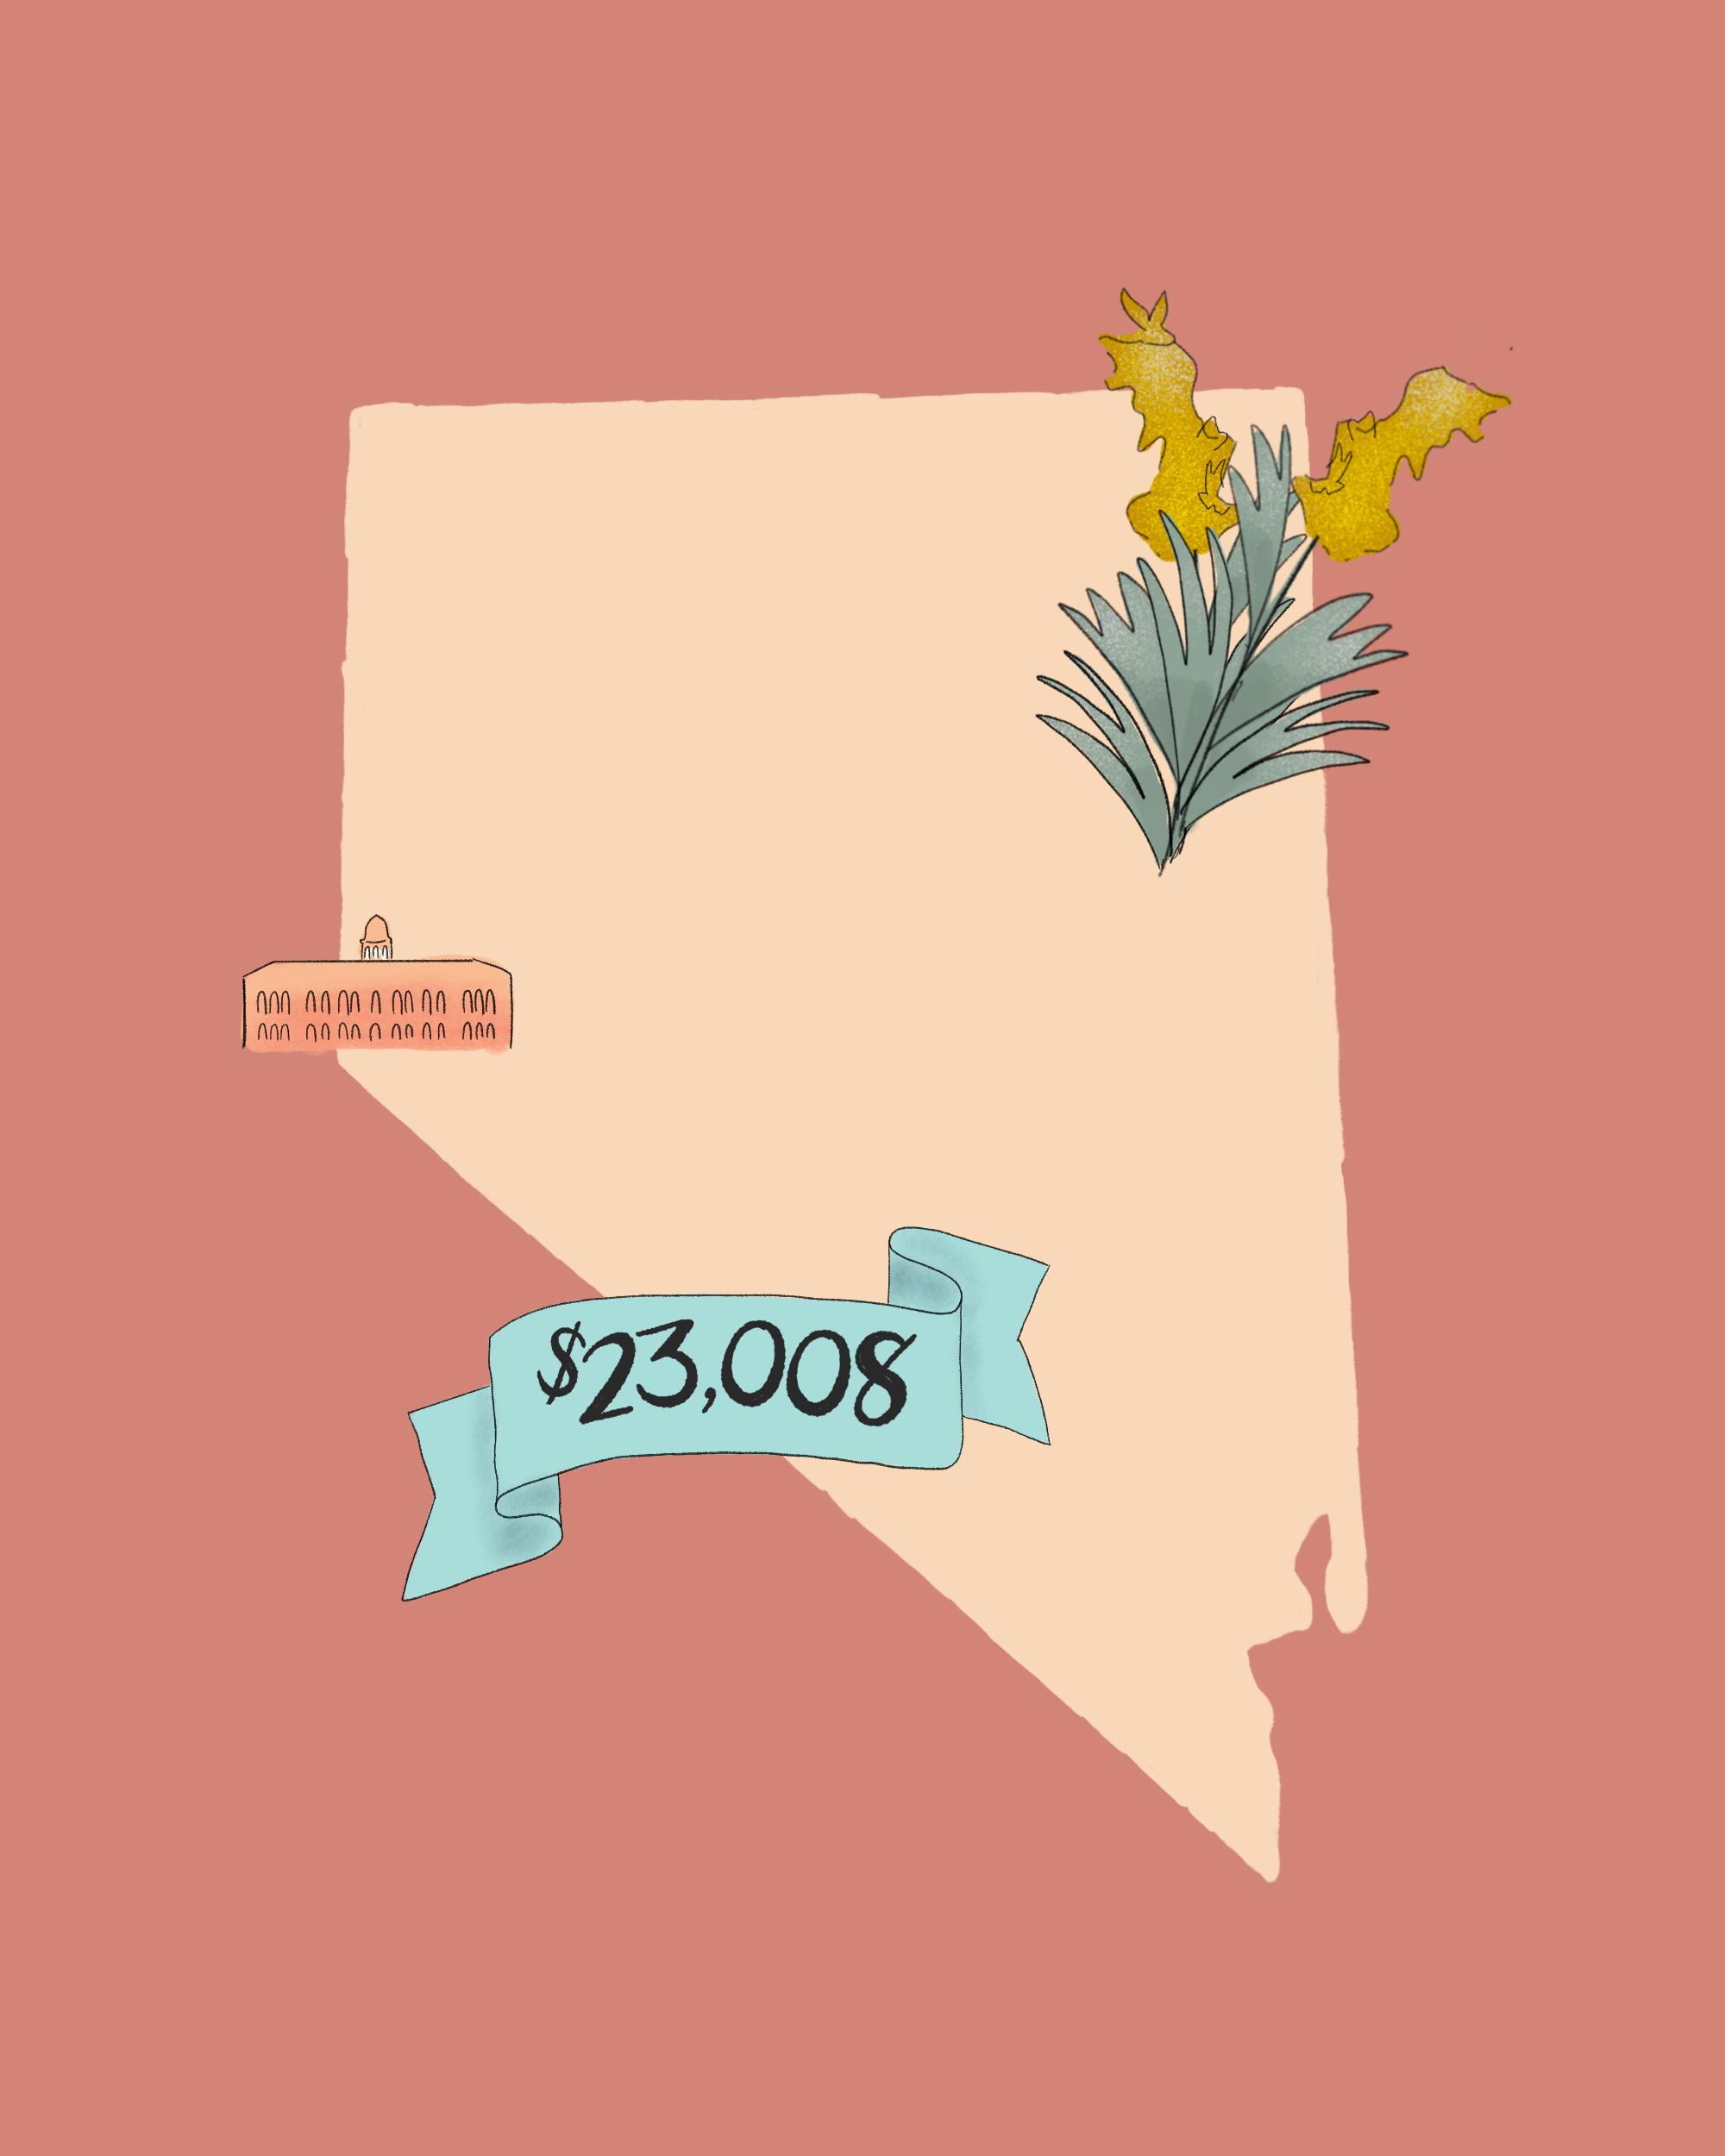 state wedding costs illustration nevada